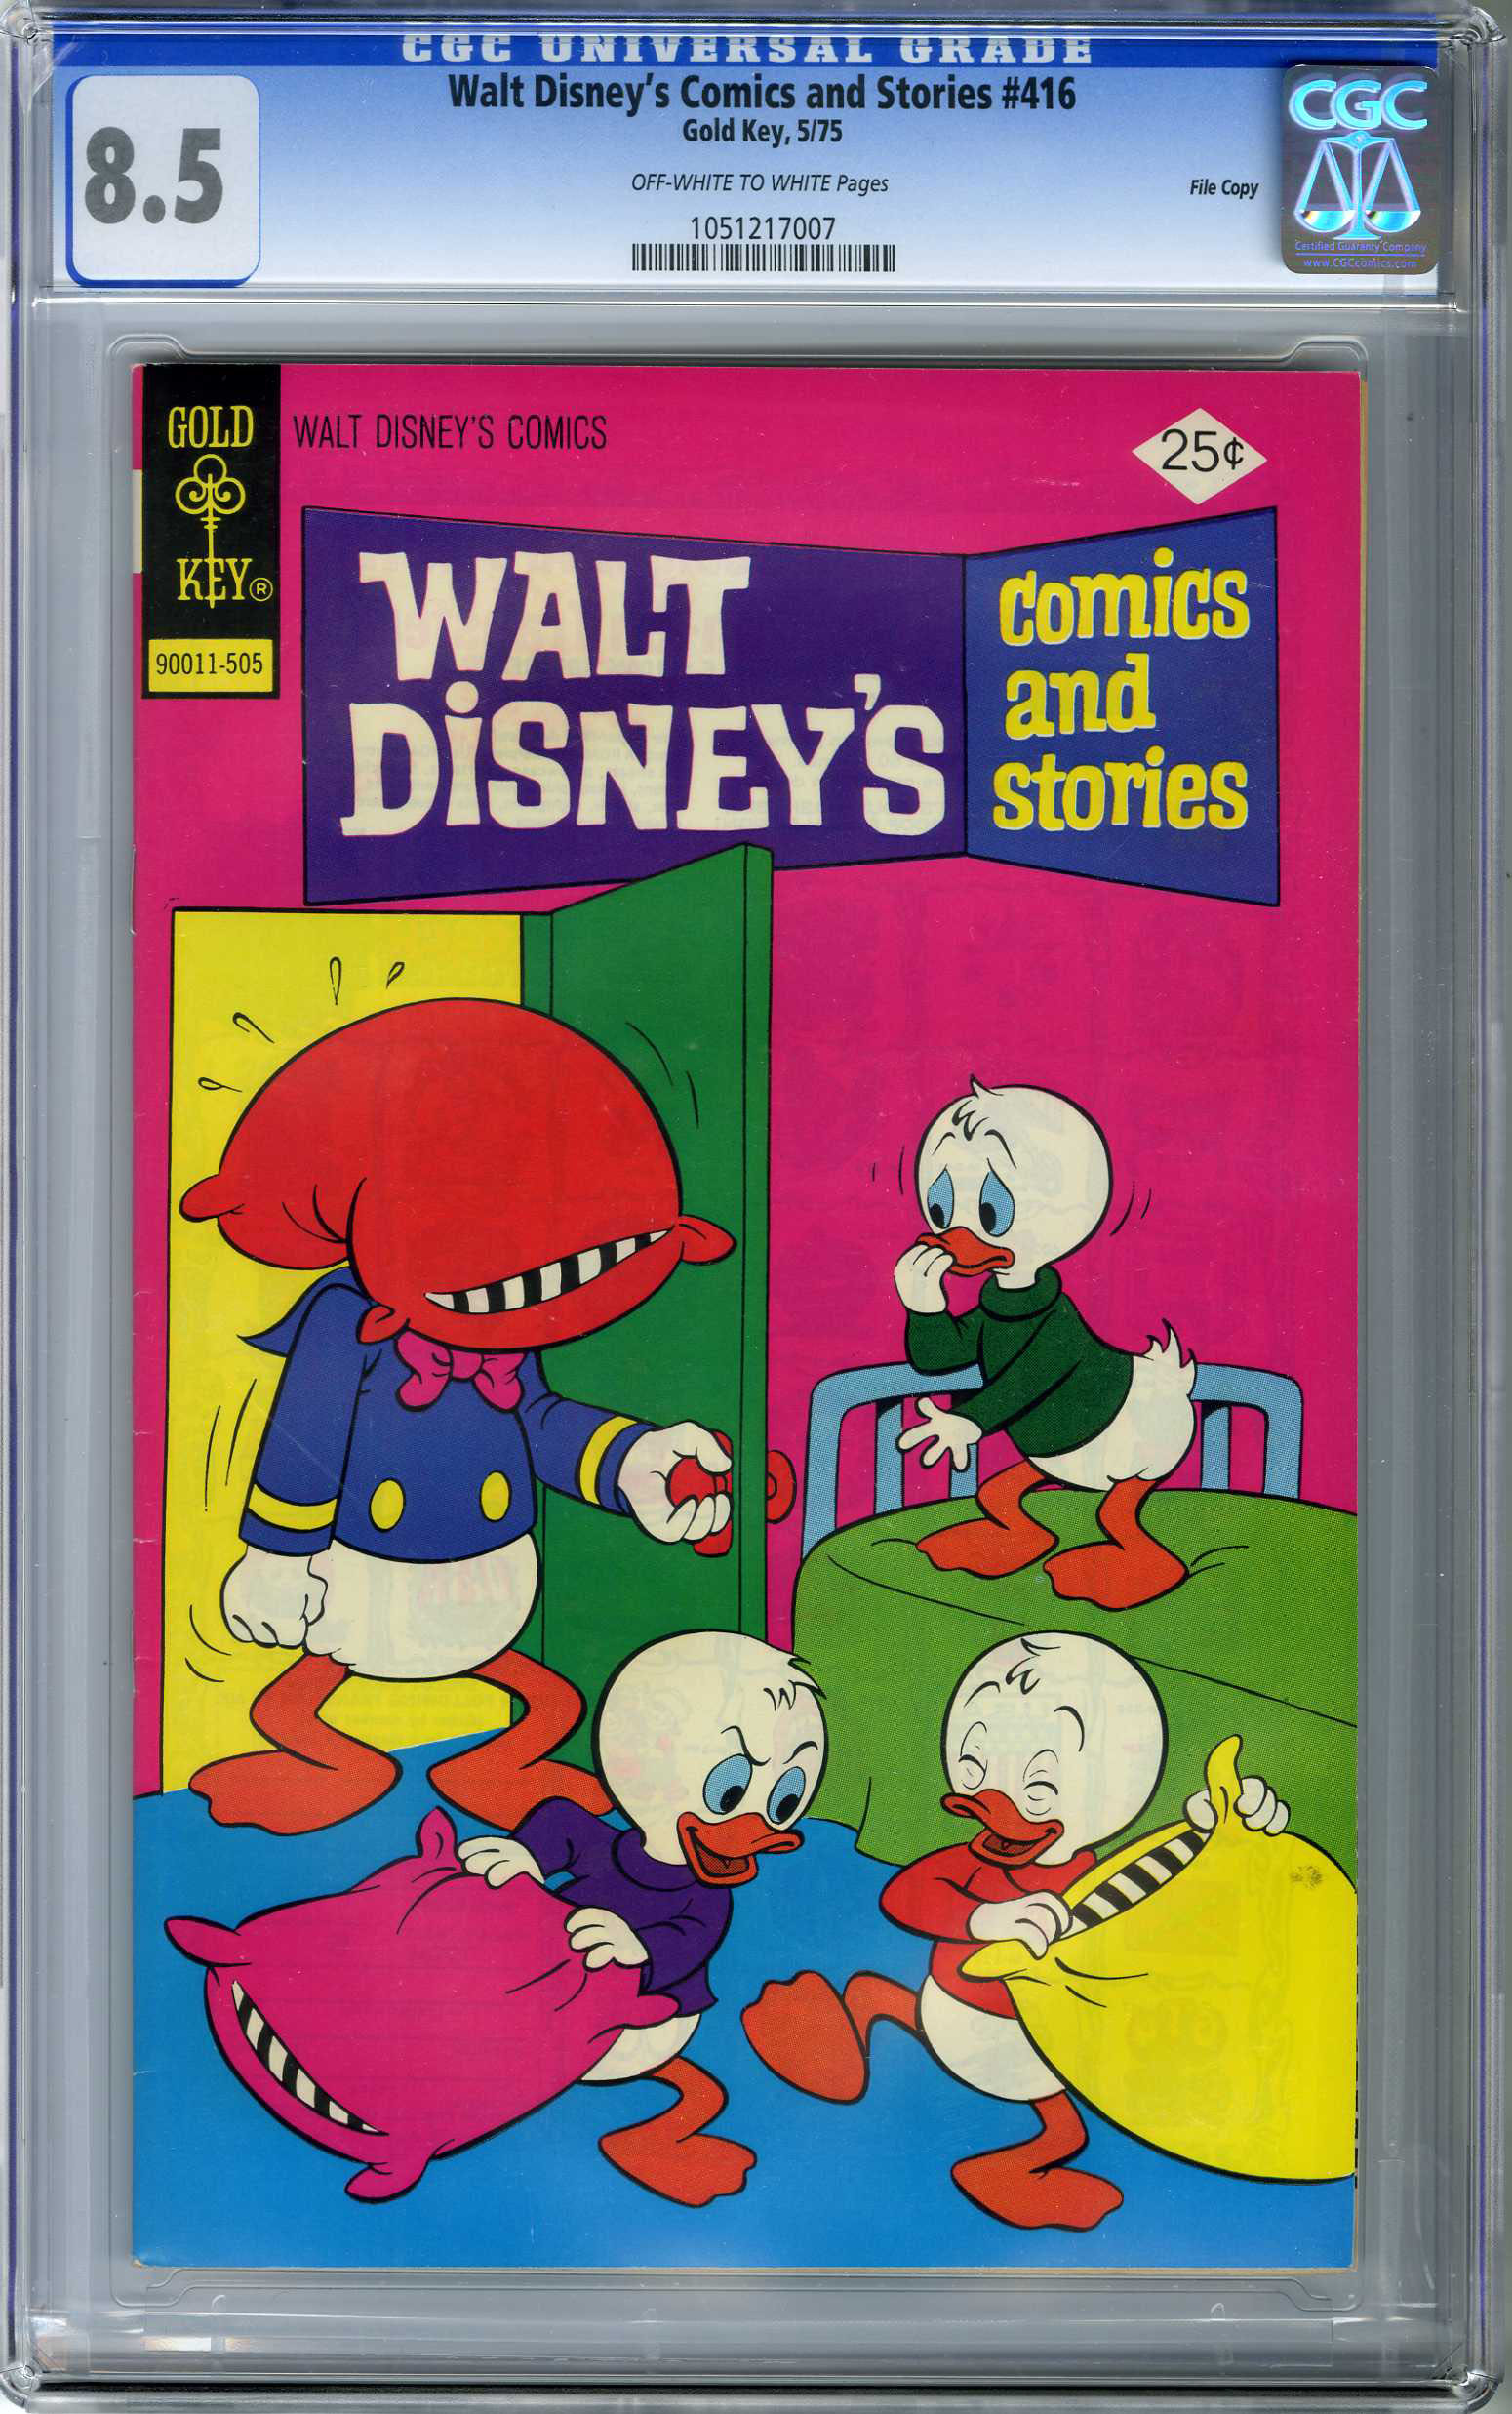 WALT DISNEY'S COMICS & STORIES #416 (1975) CGC VF+ 8.5 OWW FILE COPY/DONALD DUCK